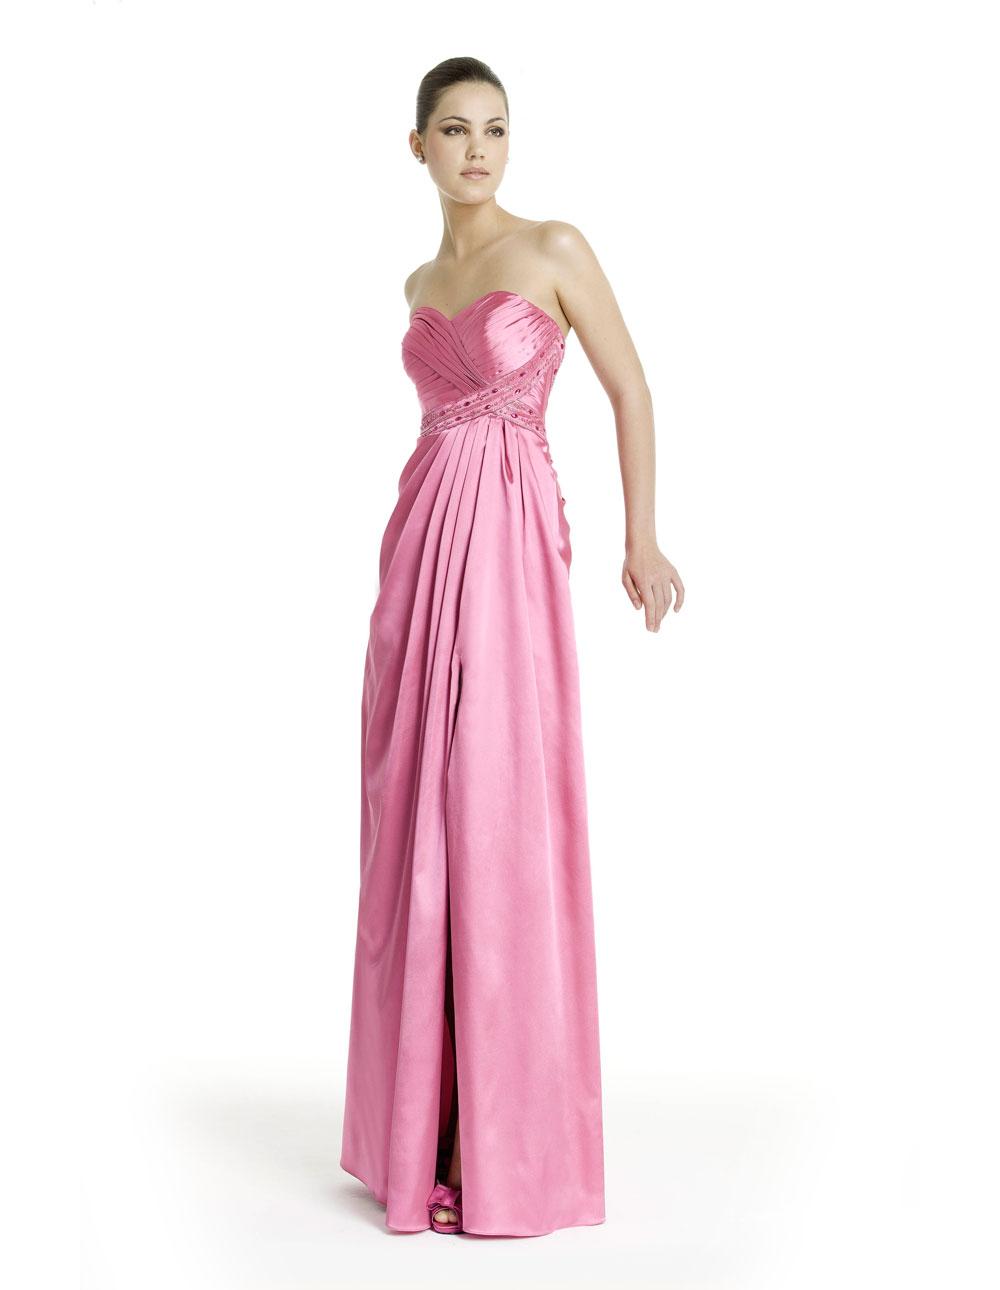 Bonito Vestidos Luna Novias Friso - Ideas de Vestido para La Novia ...